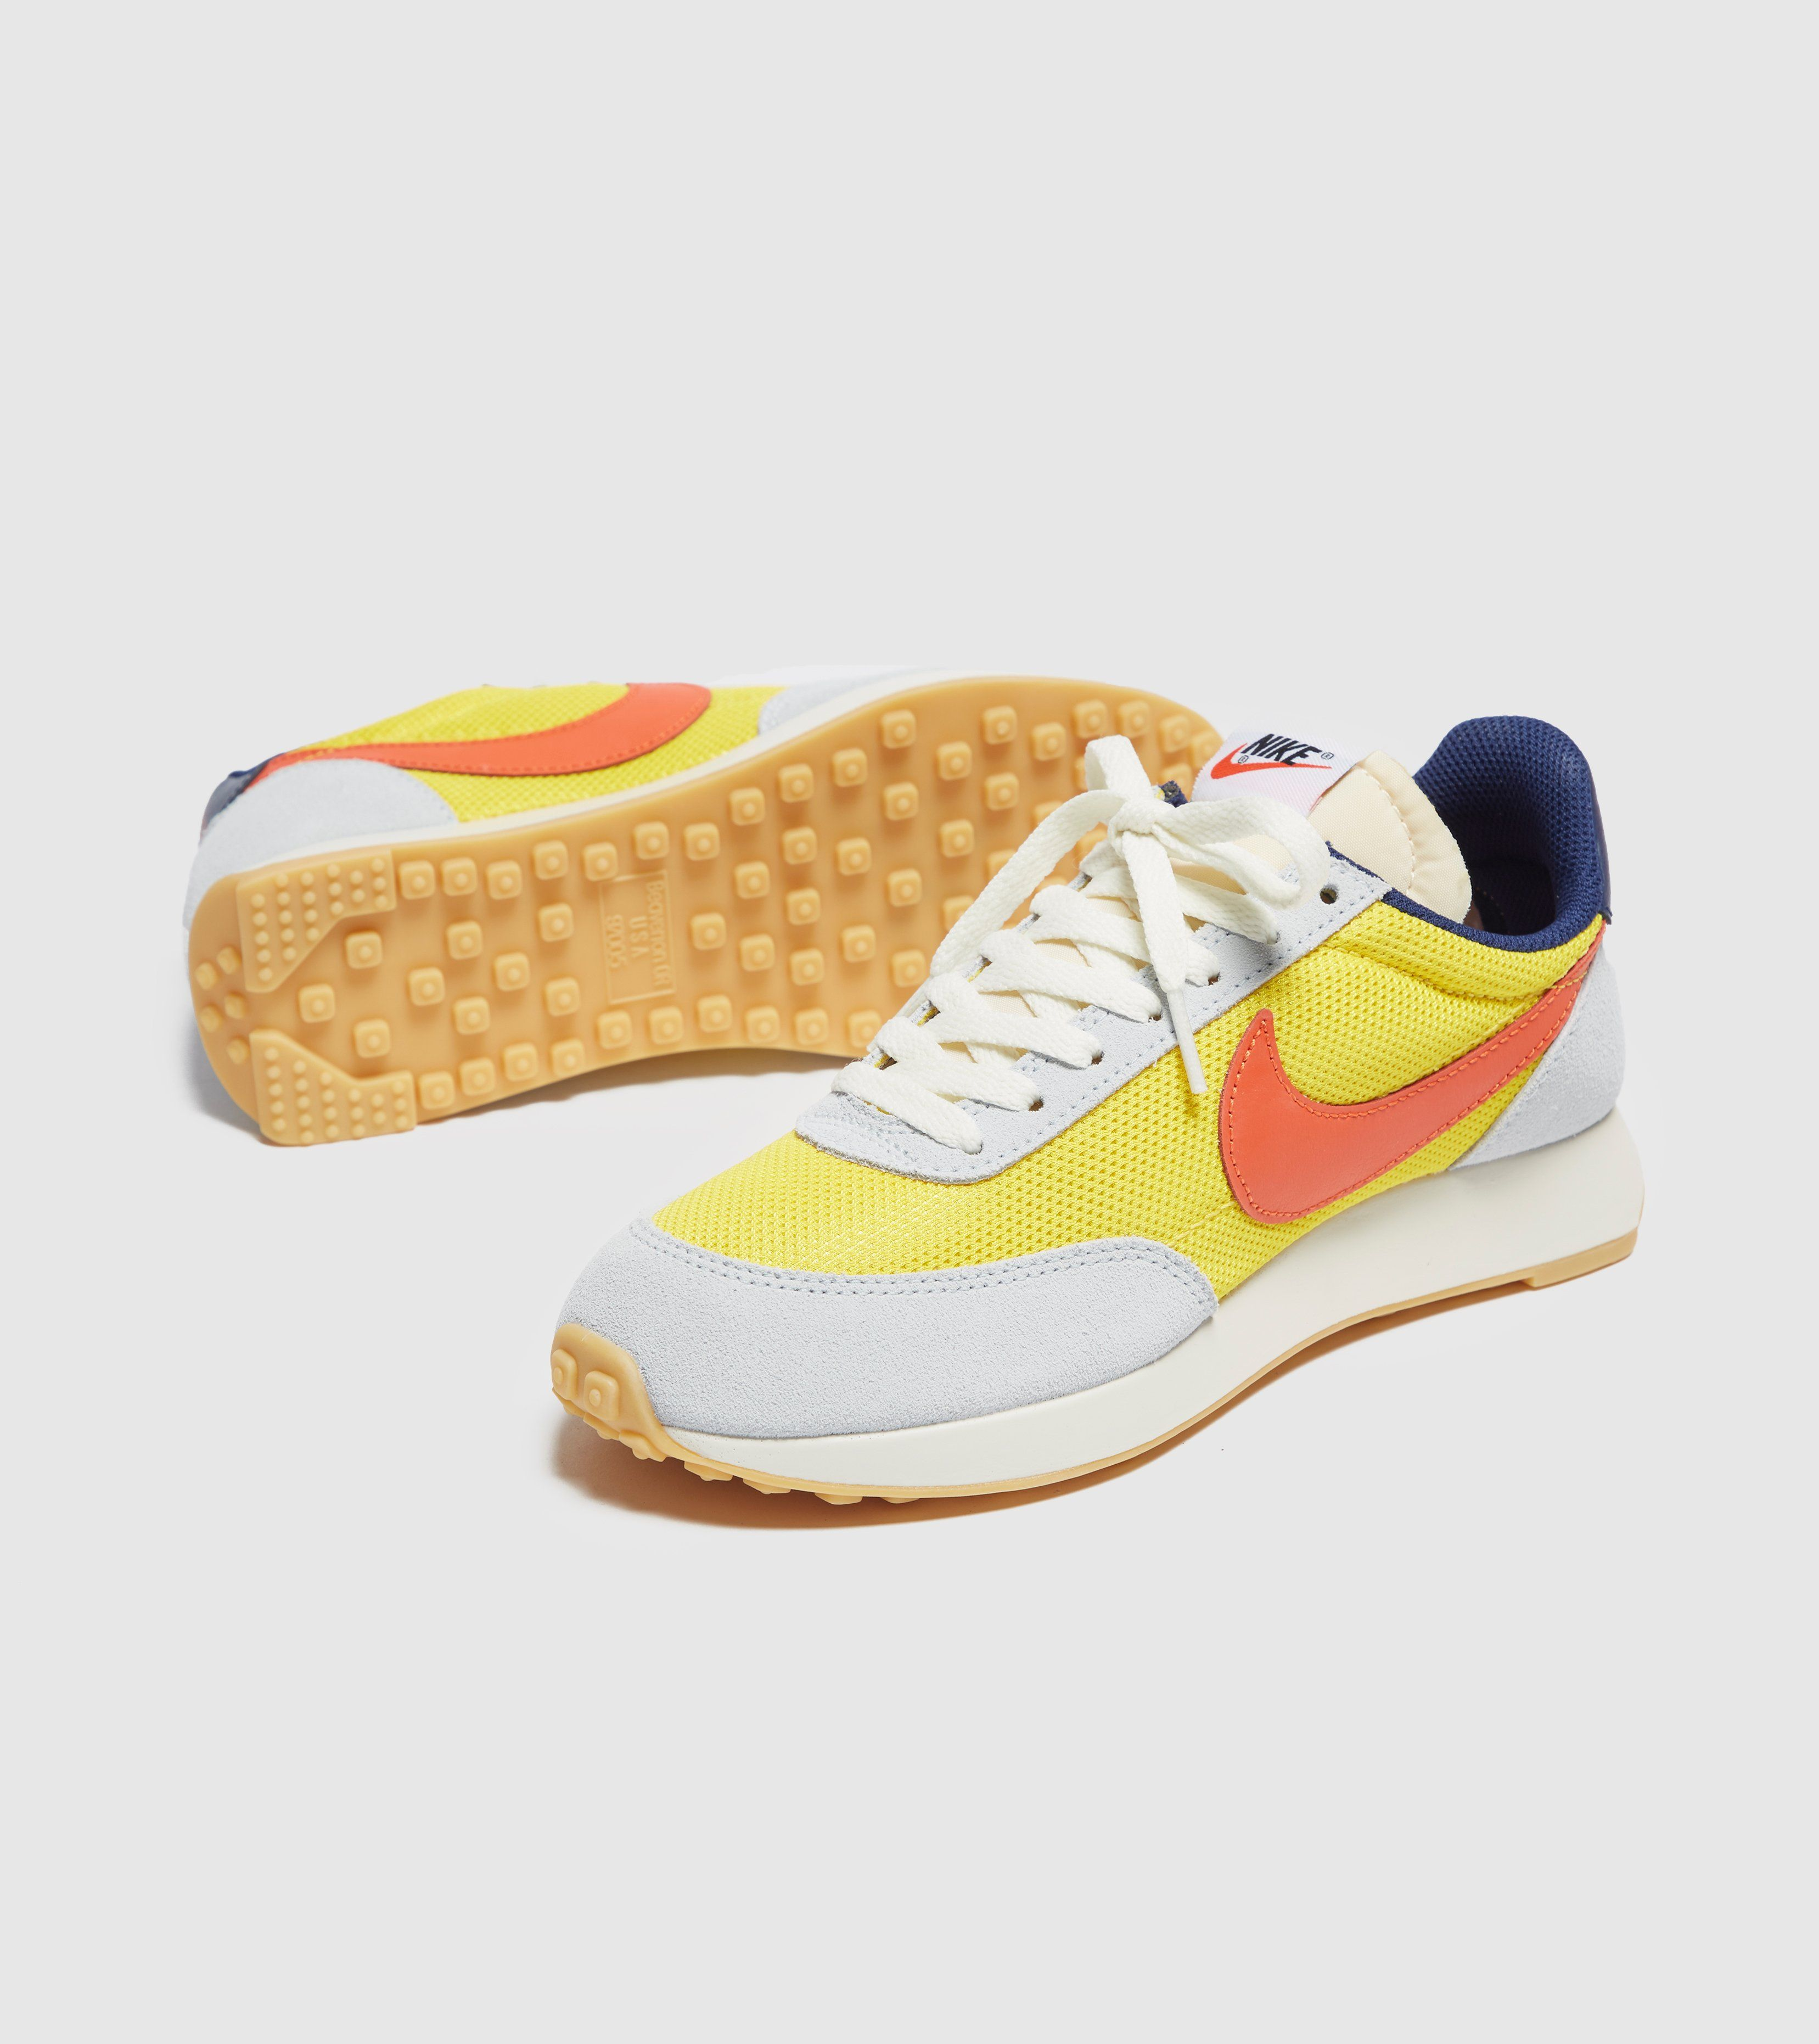 Nike Air Tailwind Femme